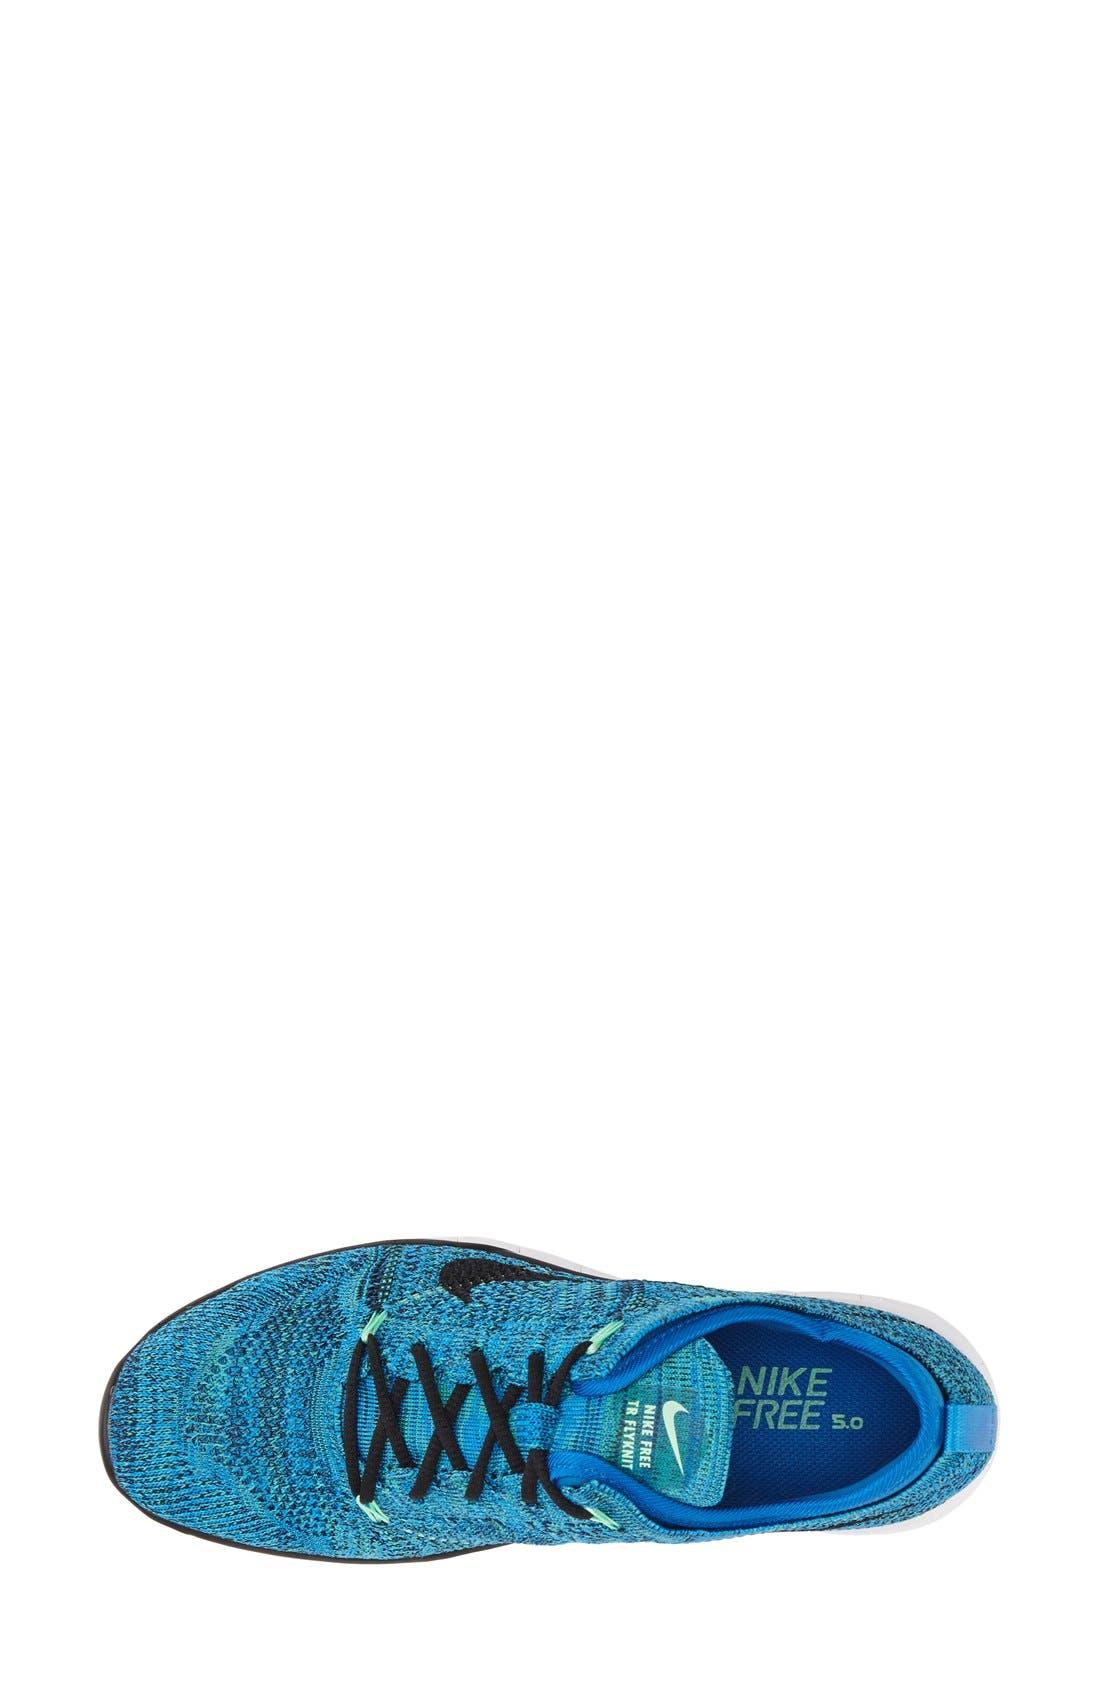 ,                             'Free Flyknit 5.0 TR' Training Shoe,                             Alternate thumbnail 30, color,                             401